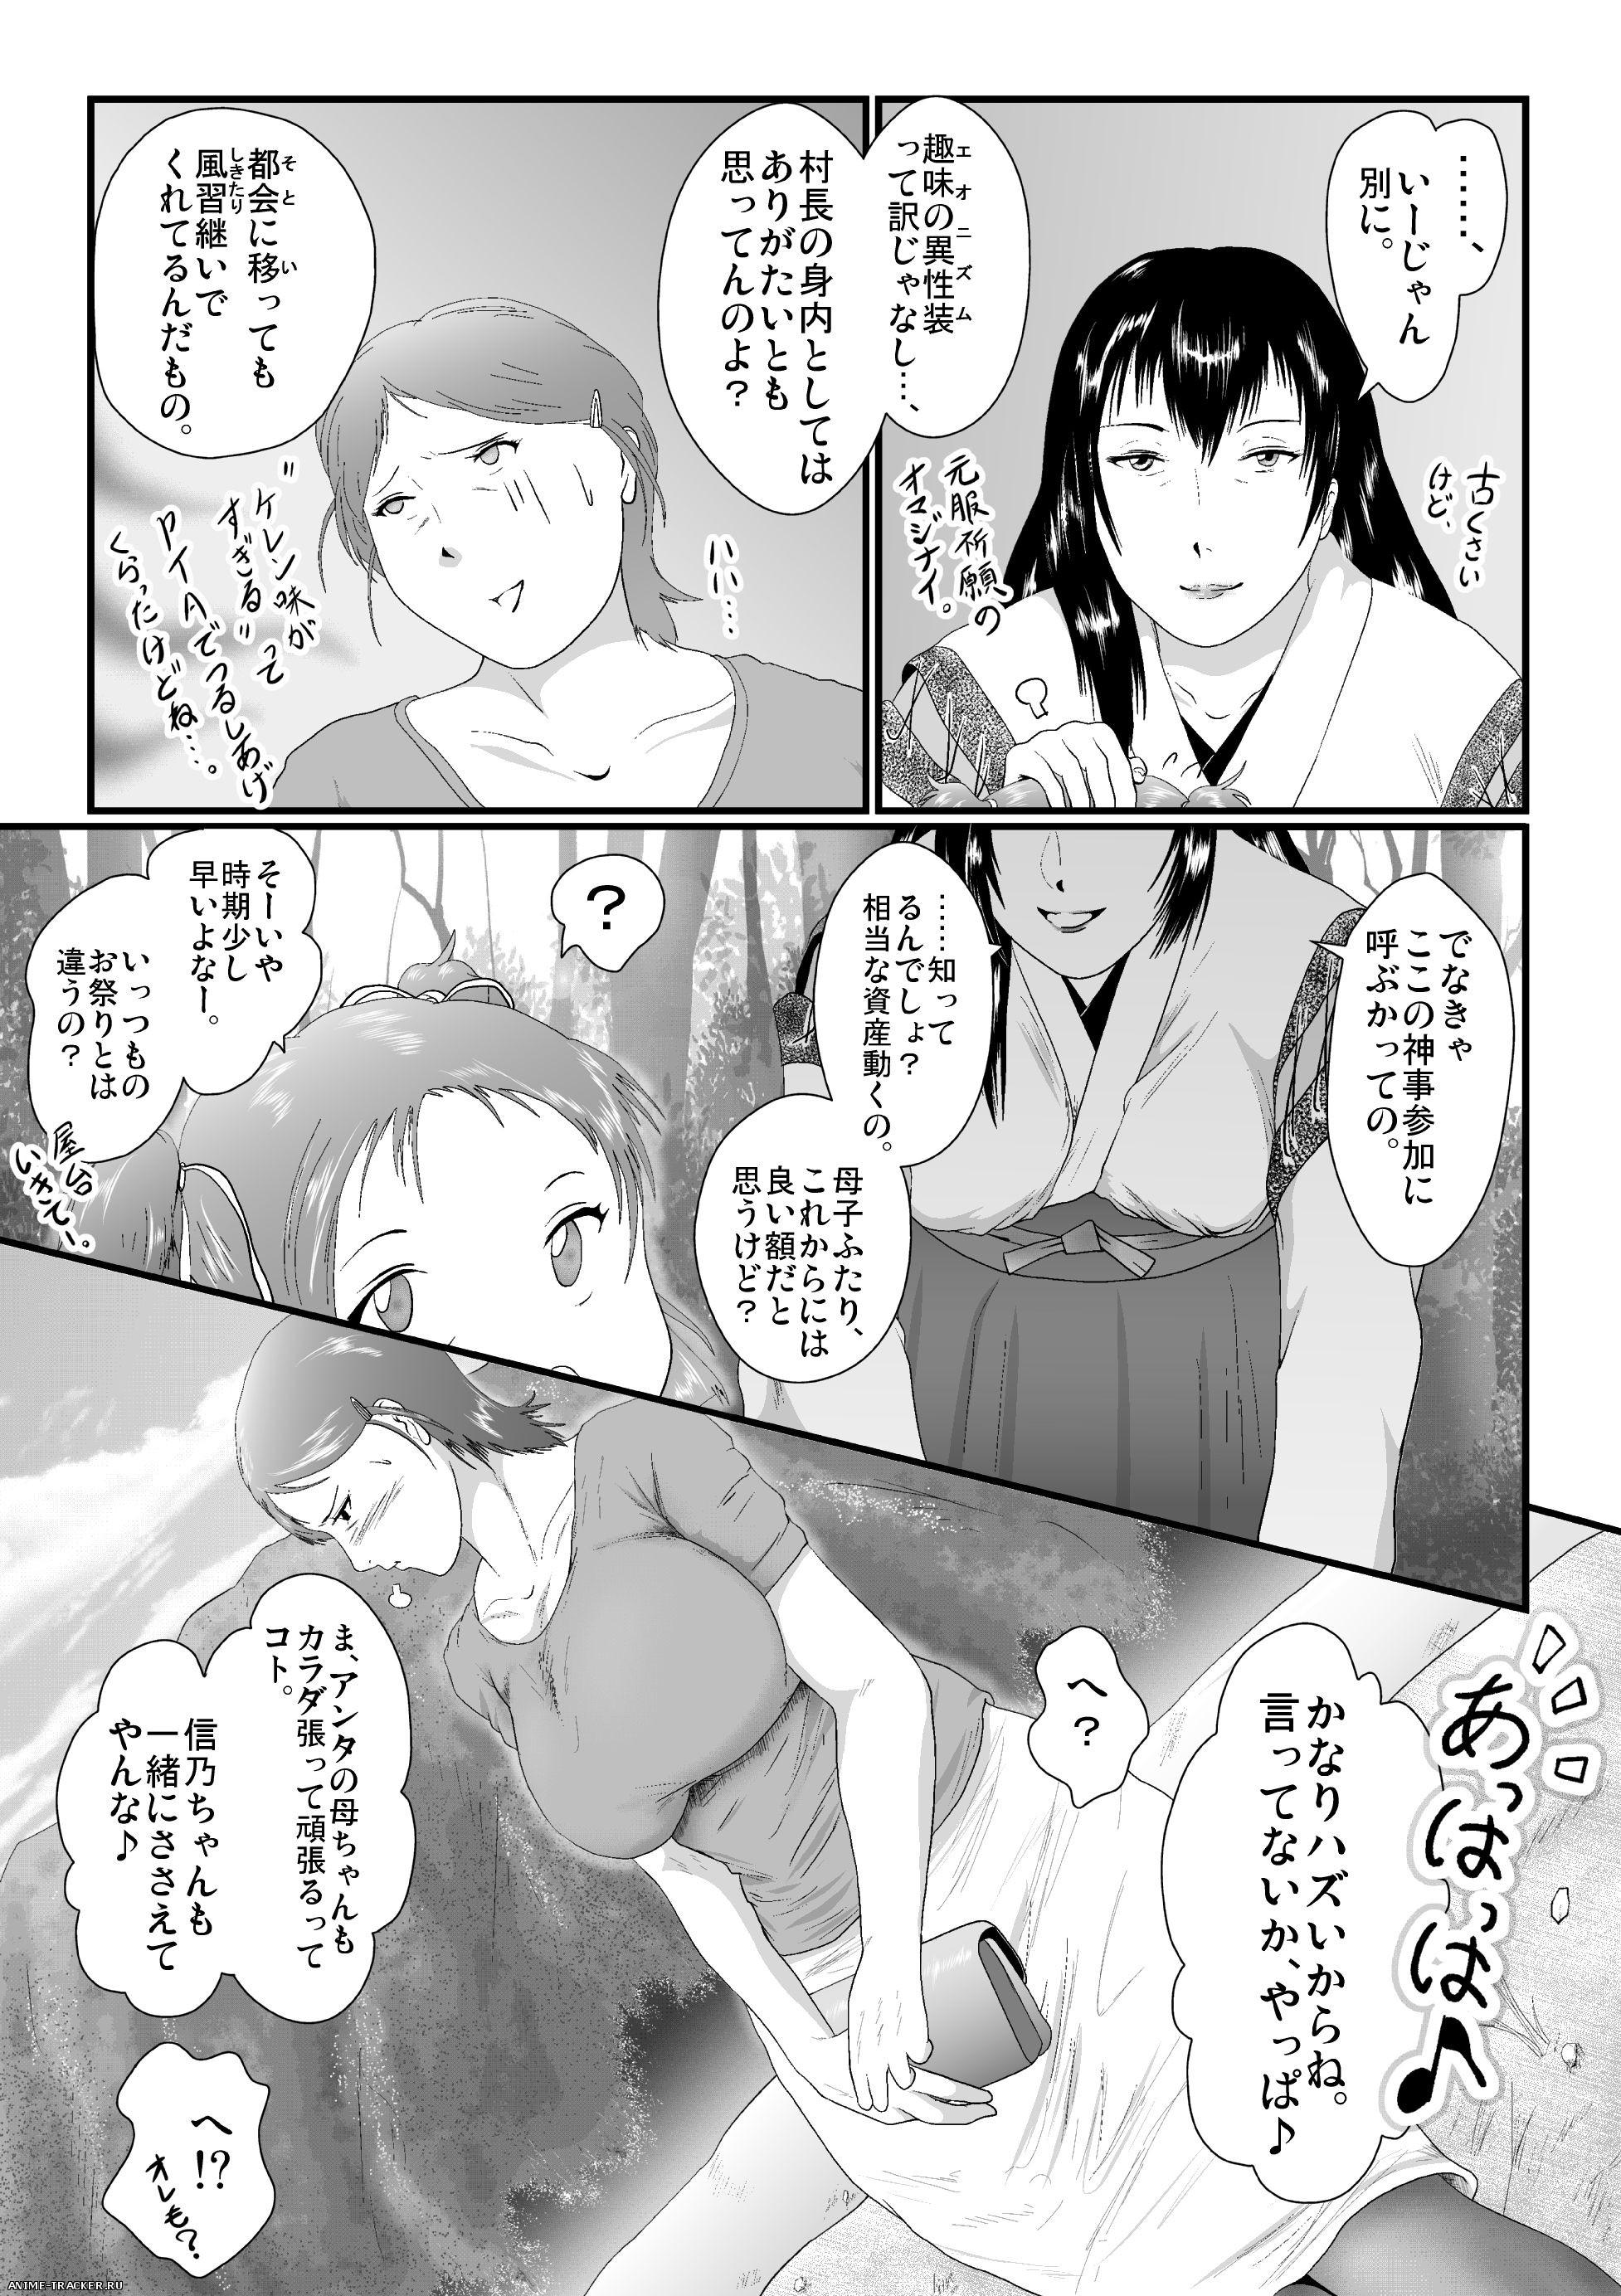 Nishiro Ui — Сборник  хентай манги [Cen] [JAP,ENG] Manga Hentai